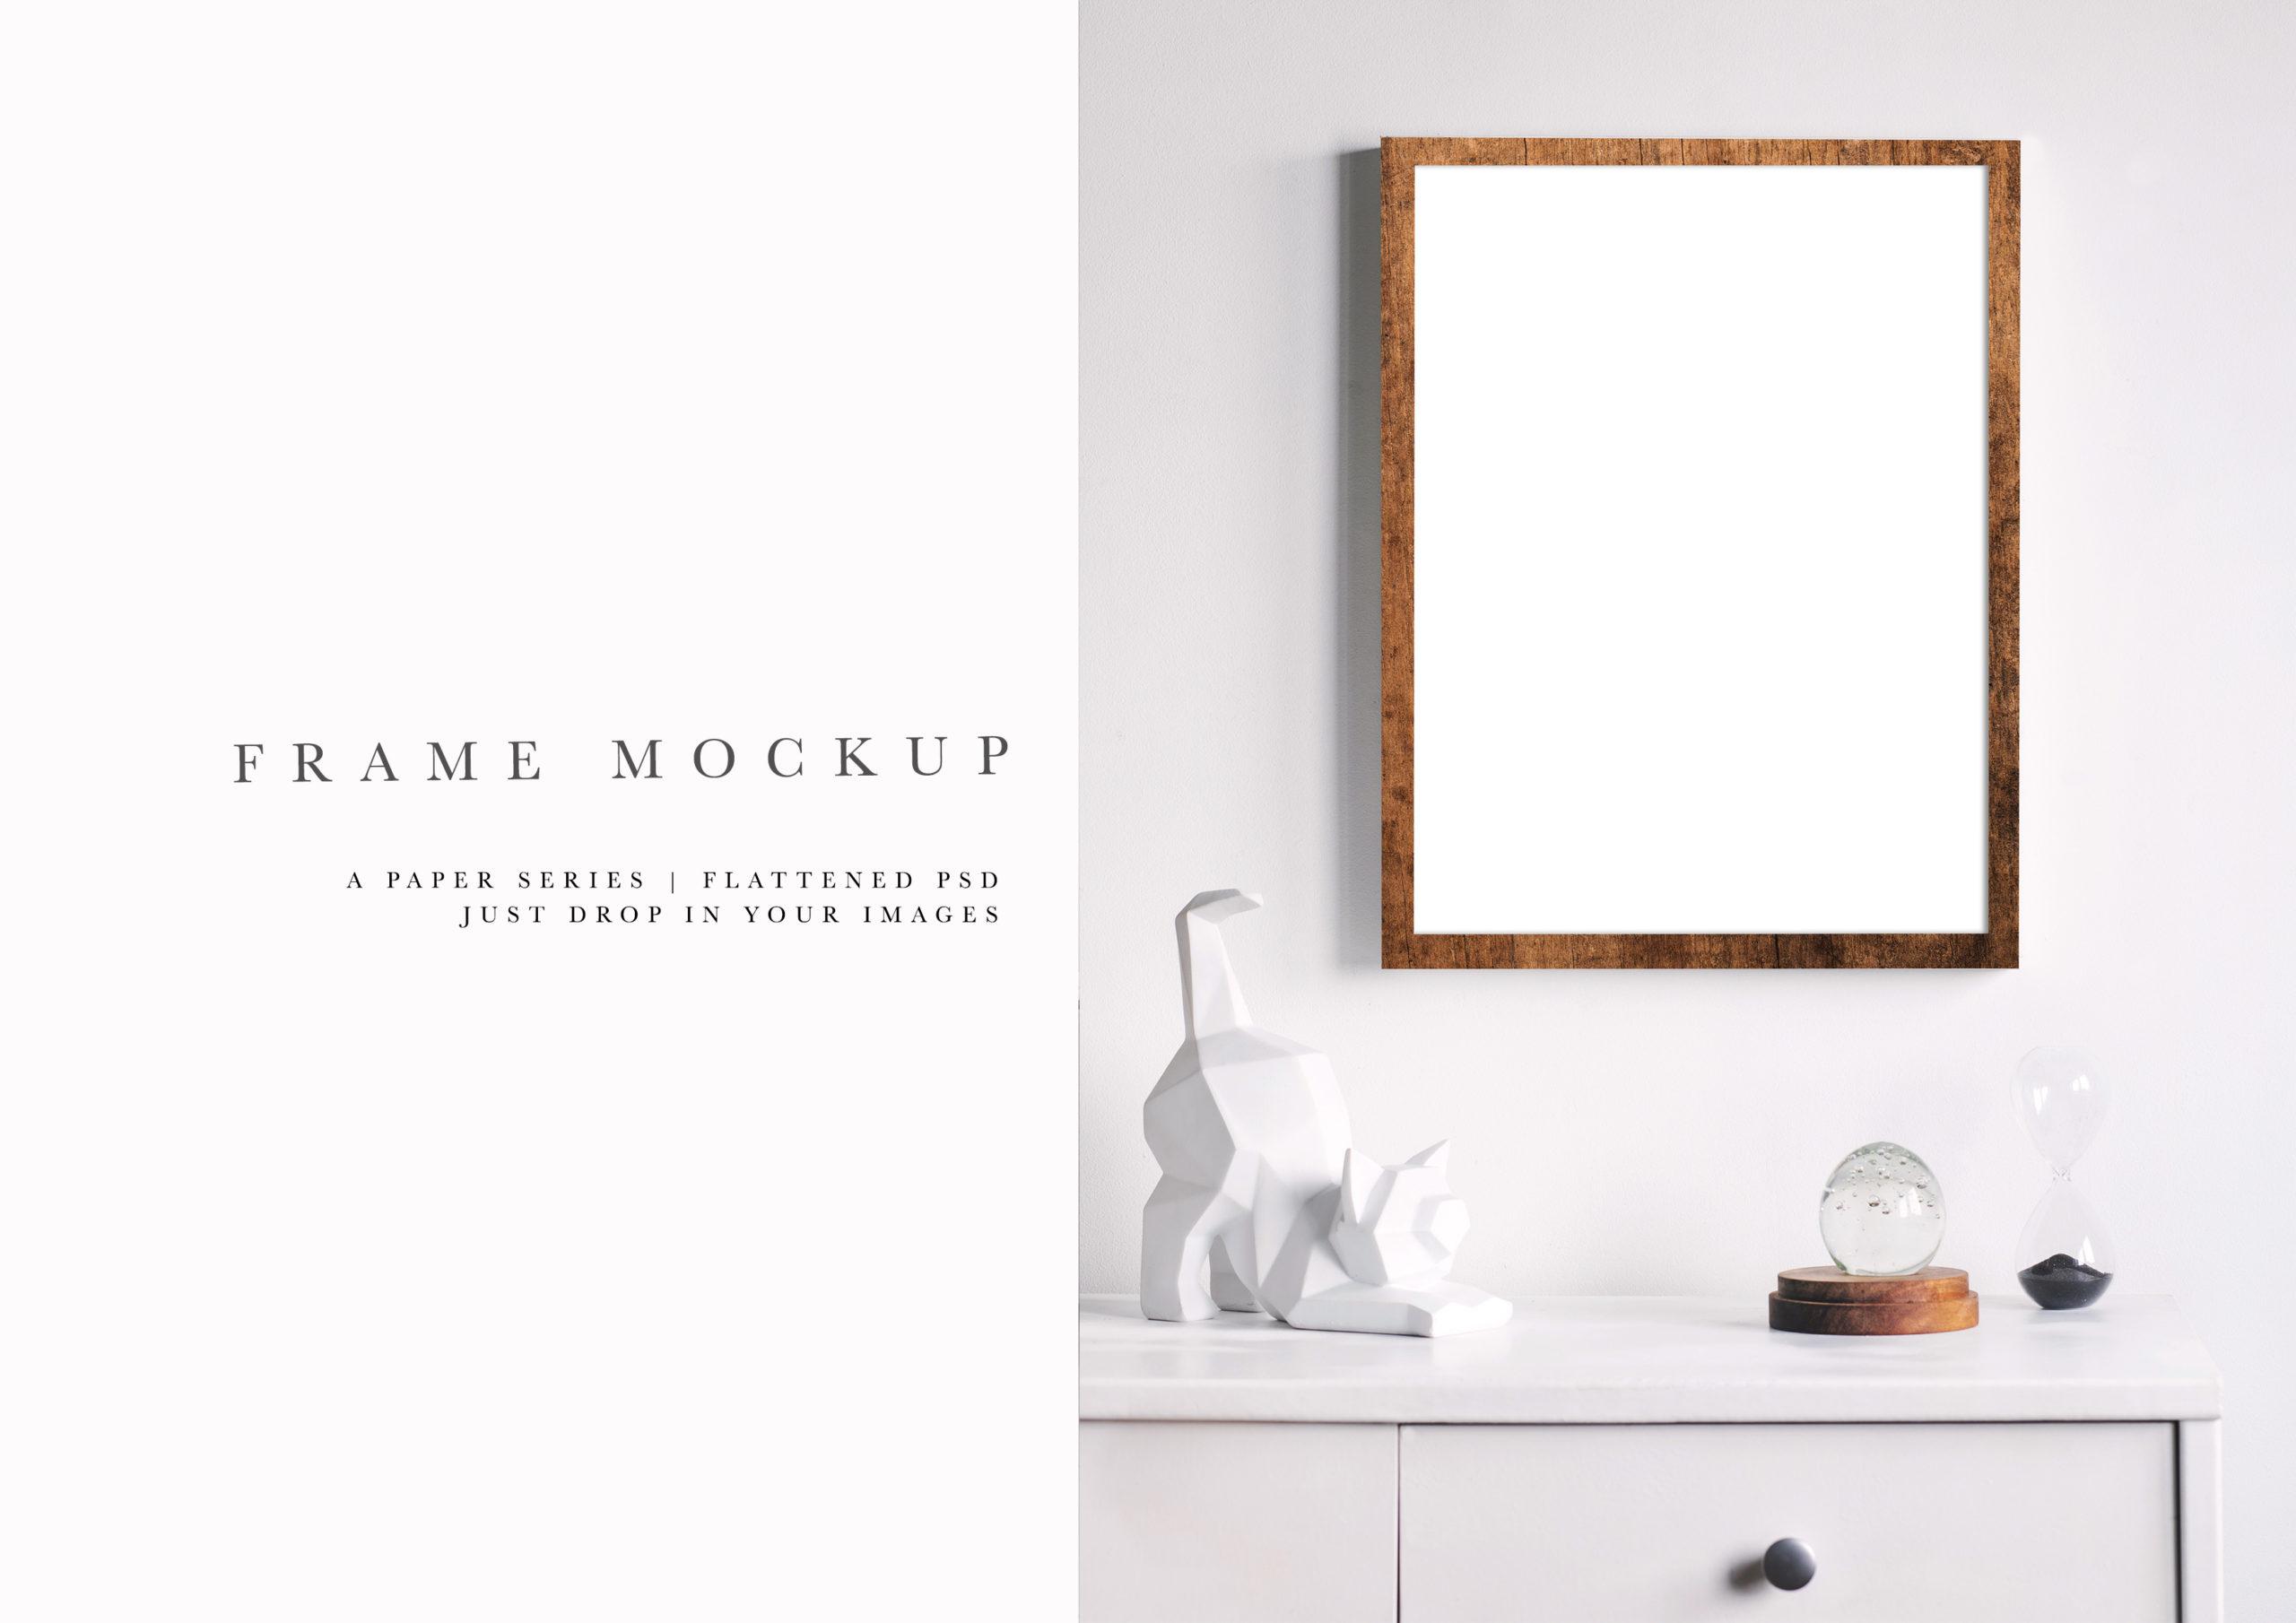 Styled Walnut Wood Portrait Photo Frame Mockup #214